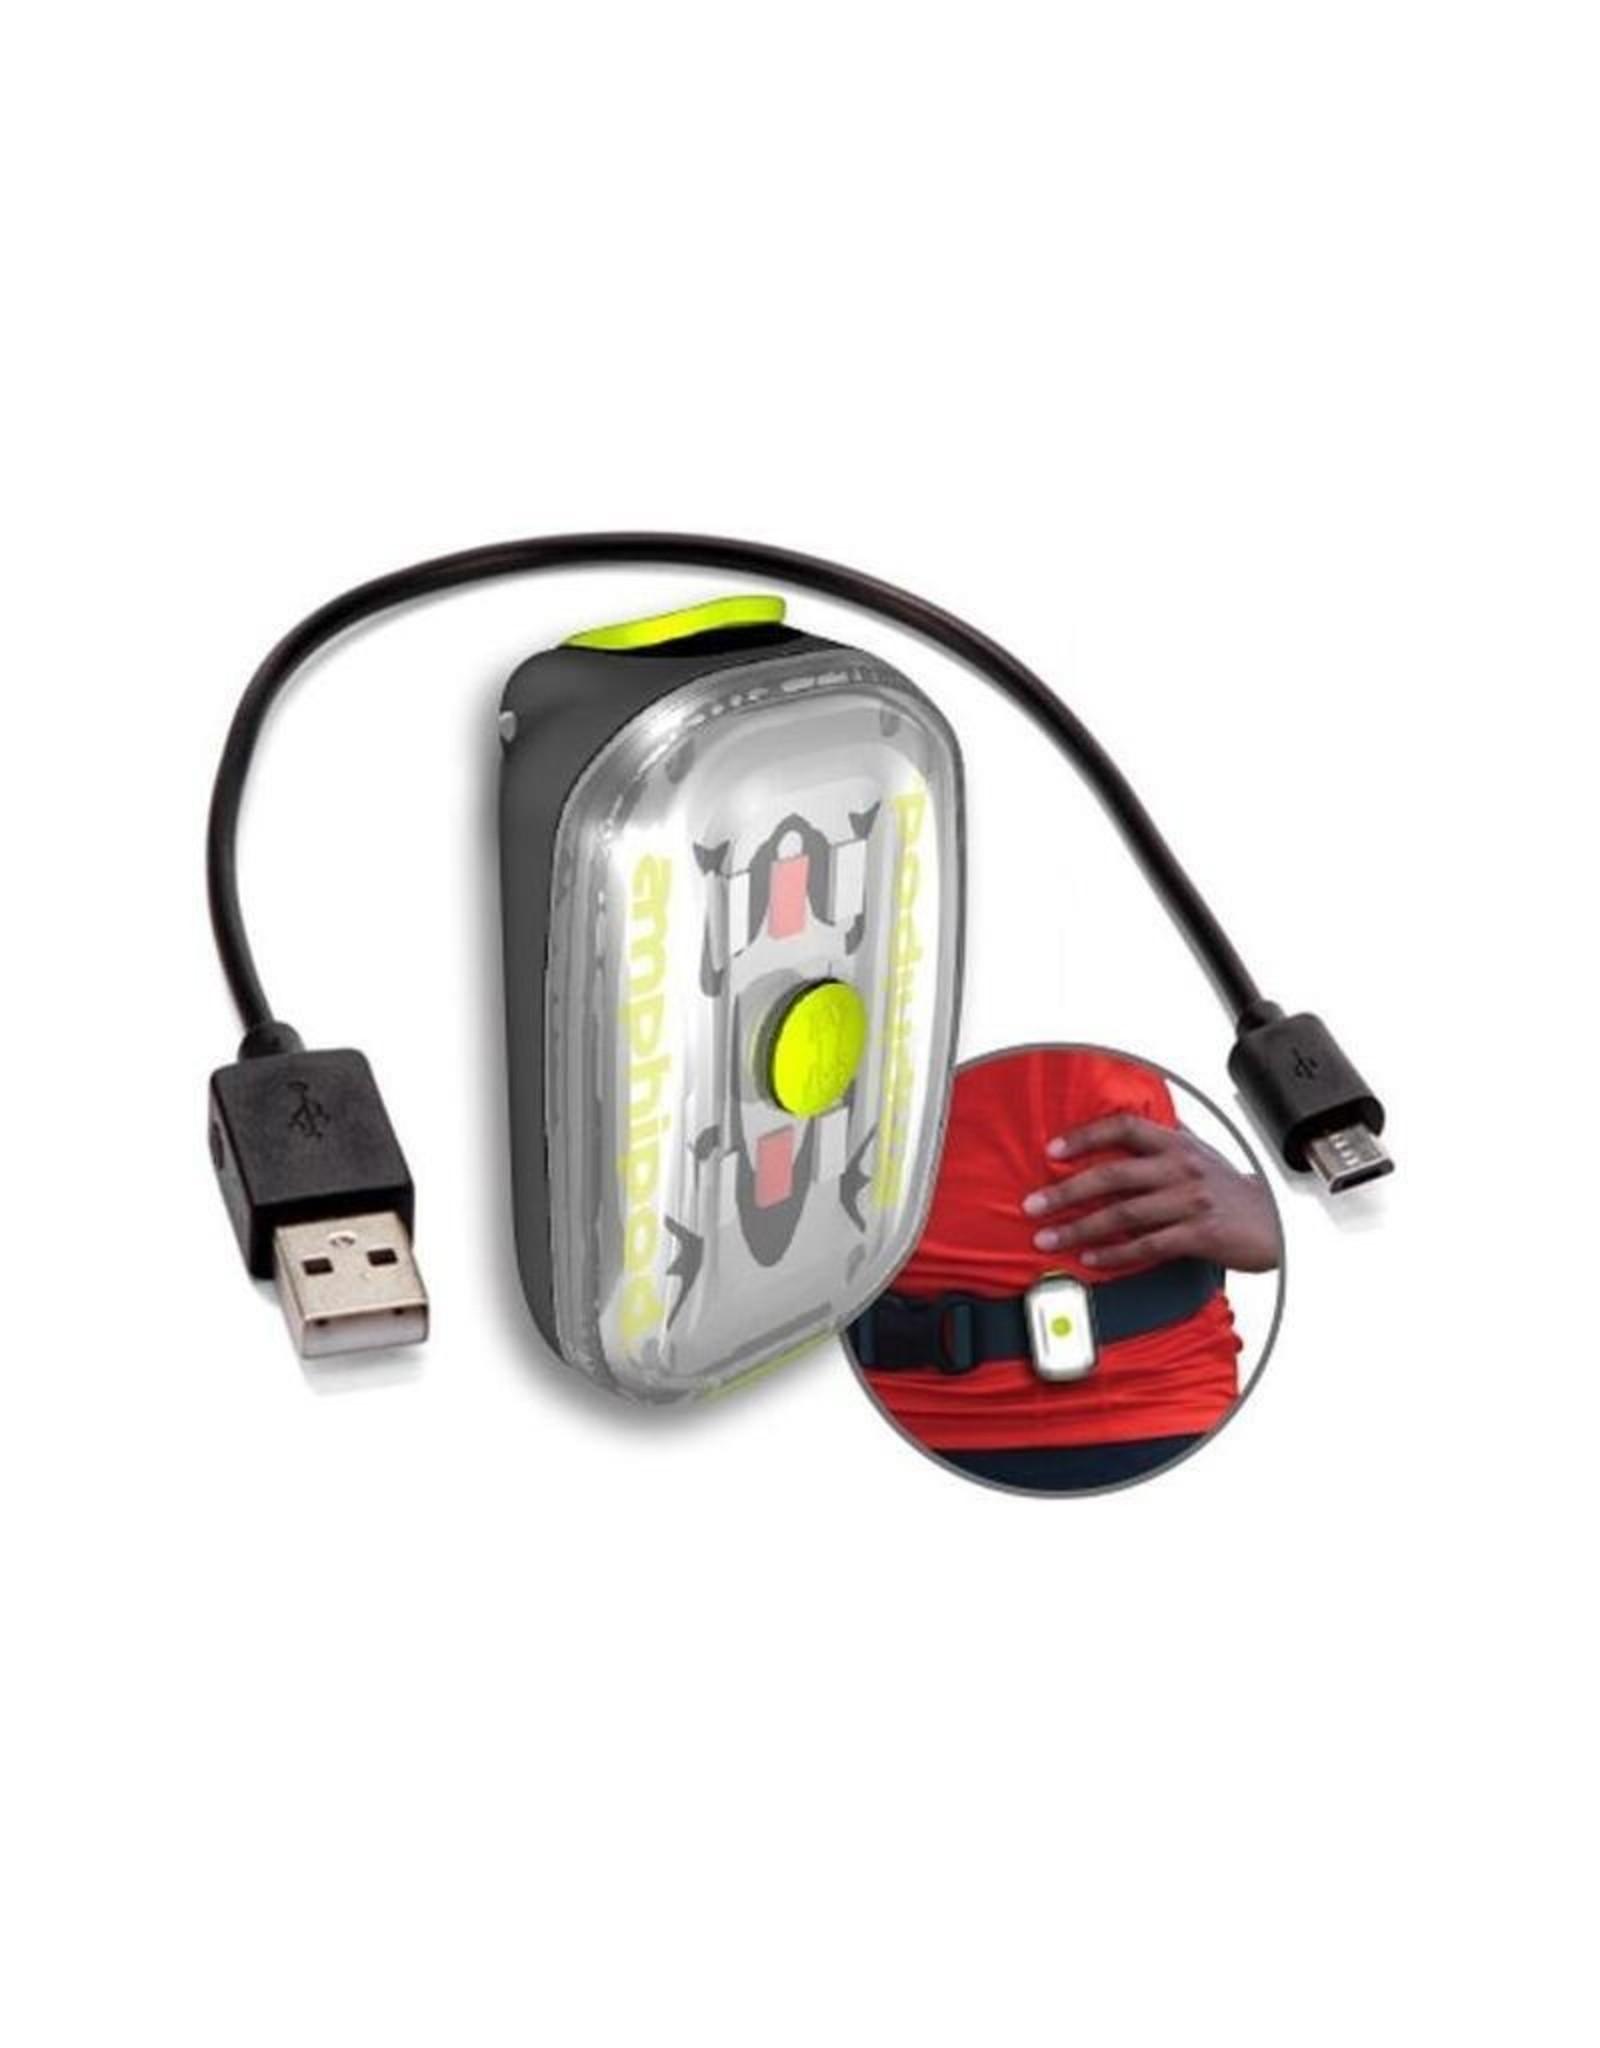 Amphipod Versa-Light Max Clip LED